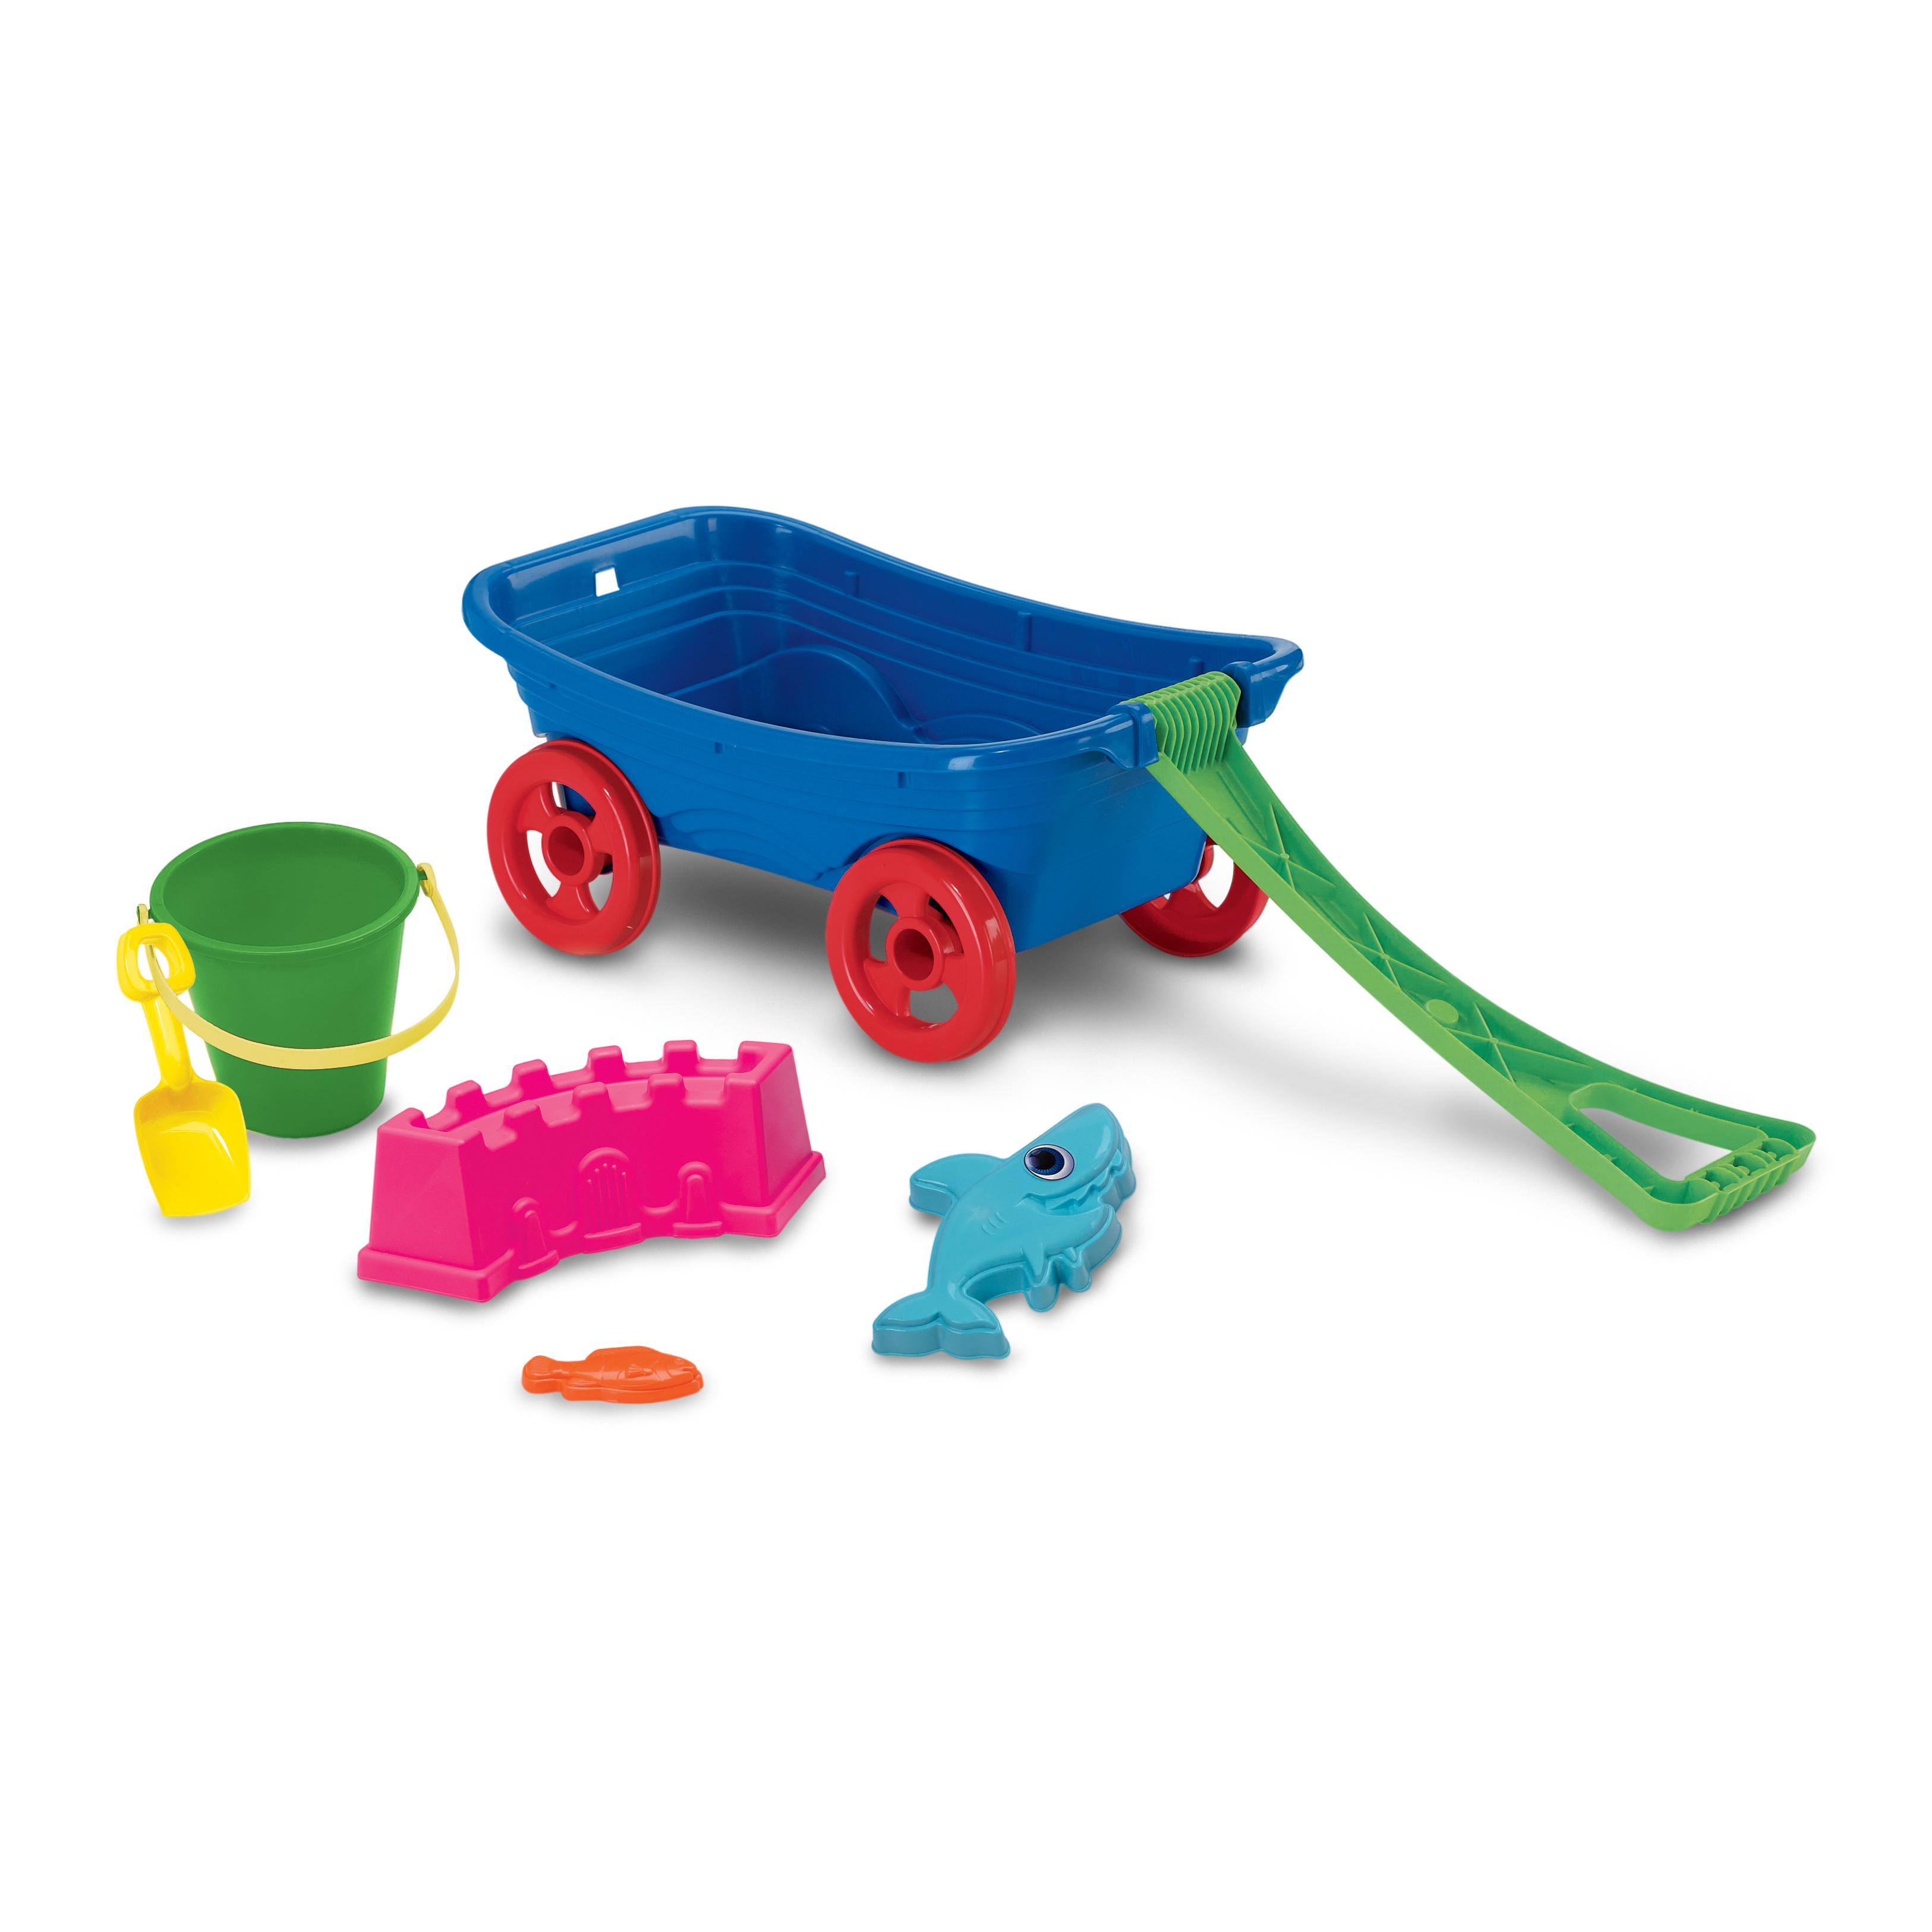 SetAmerican Beachcomber Toys Wagon Plastic Inc n08PwXOk